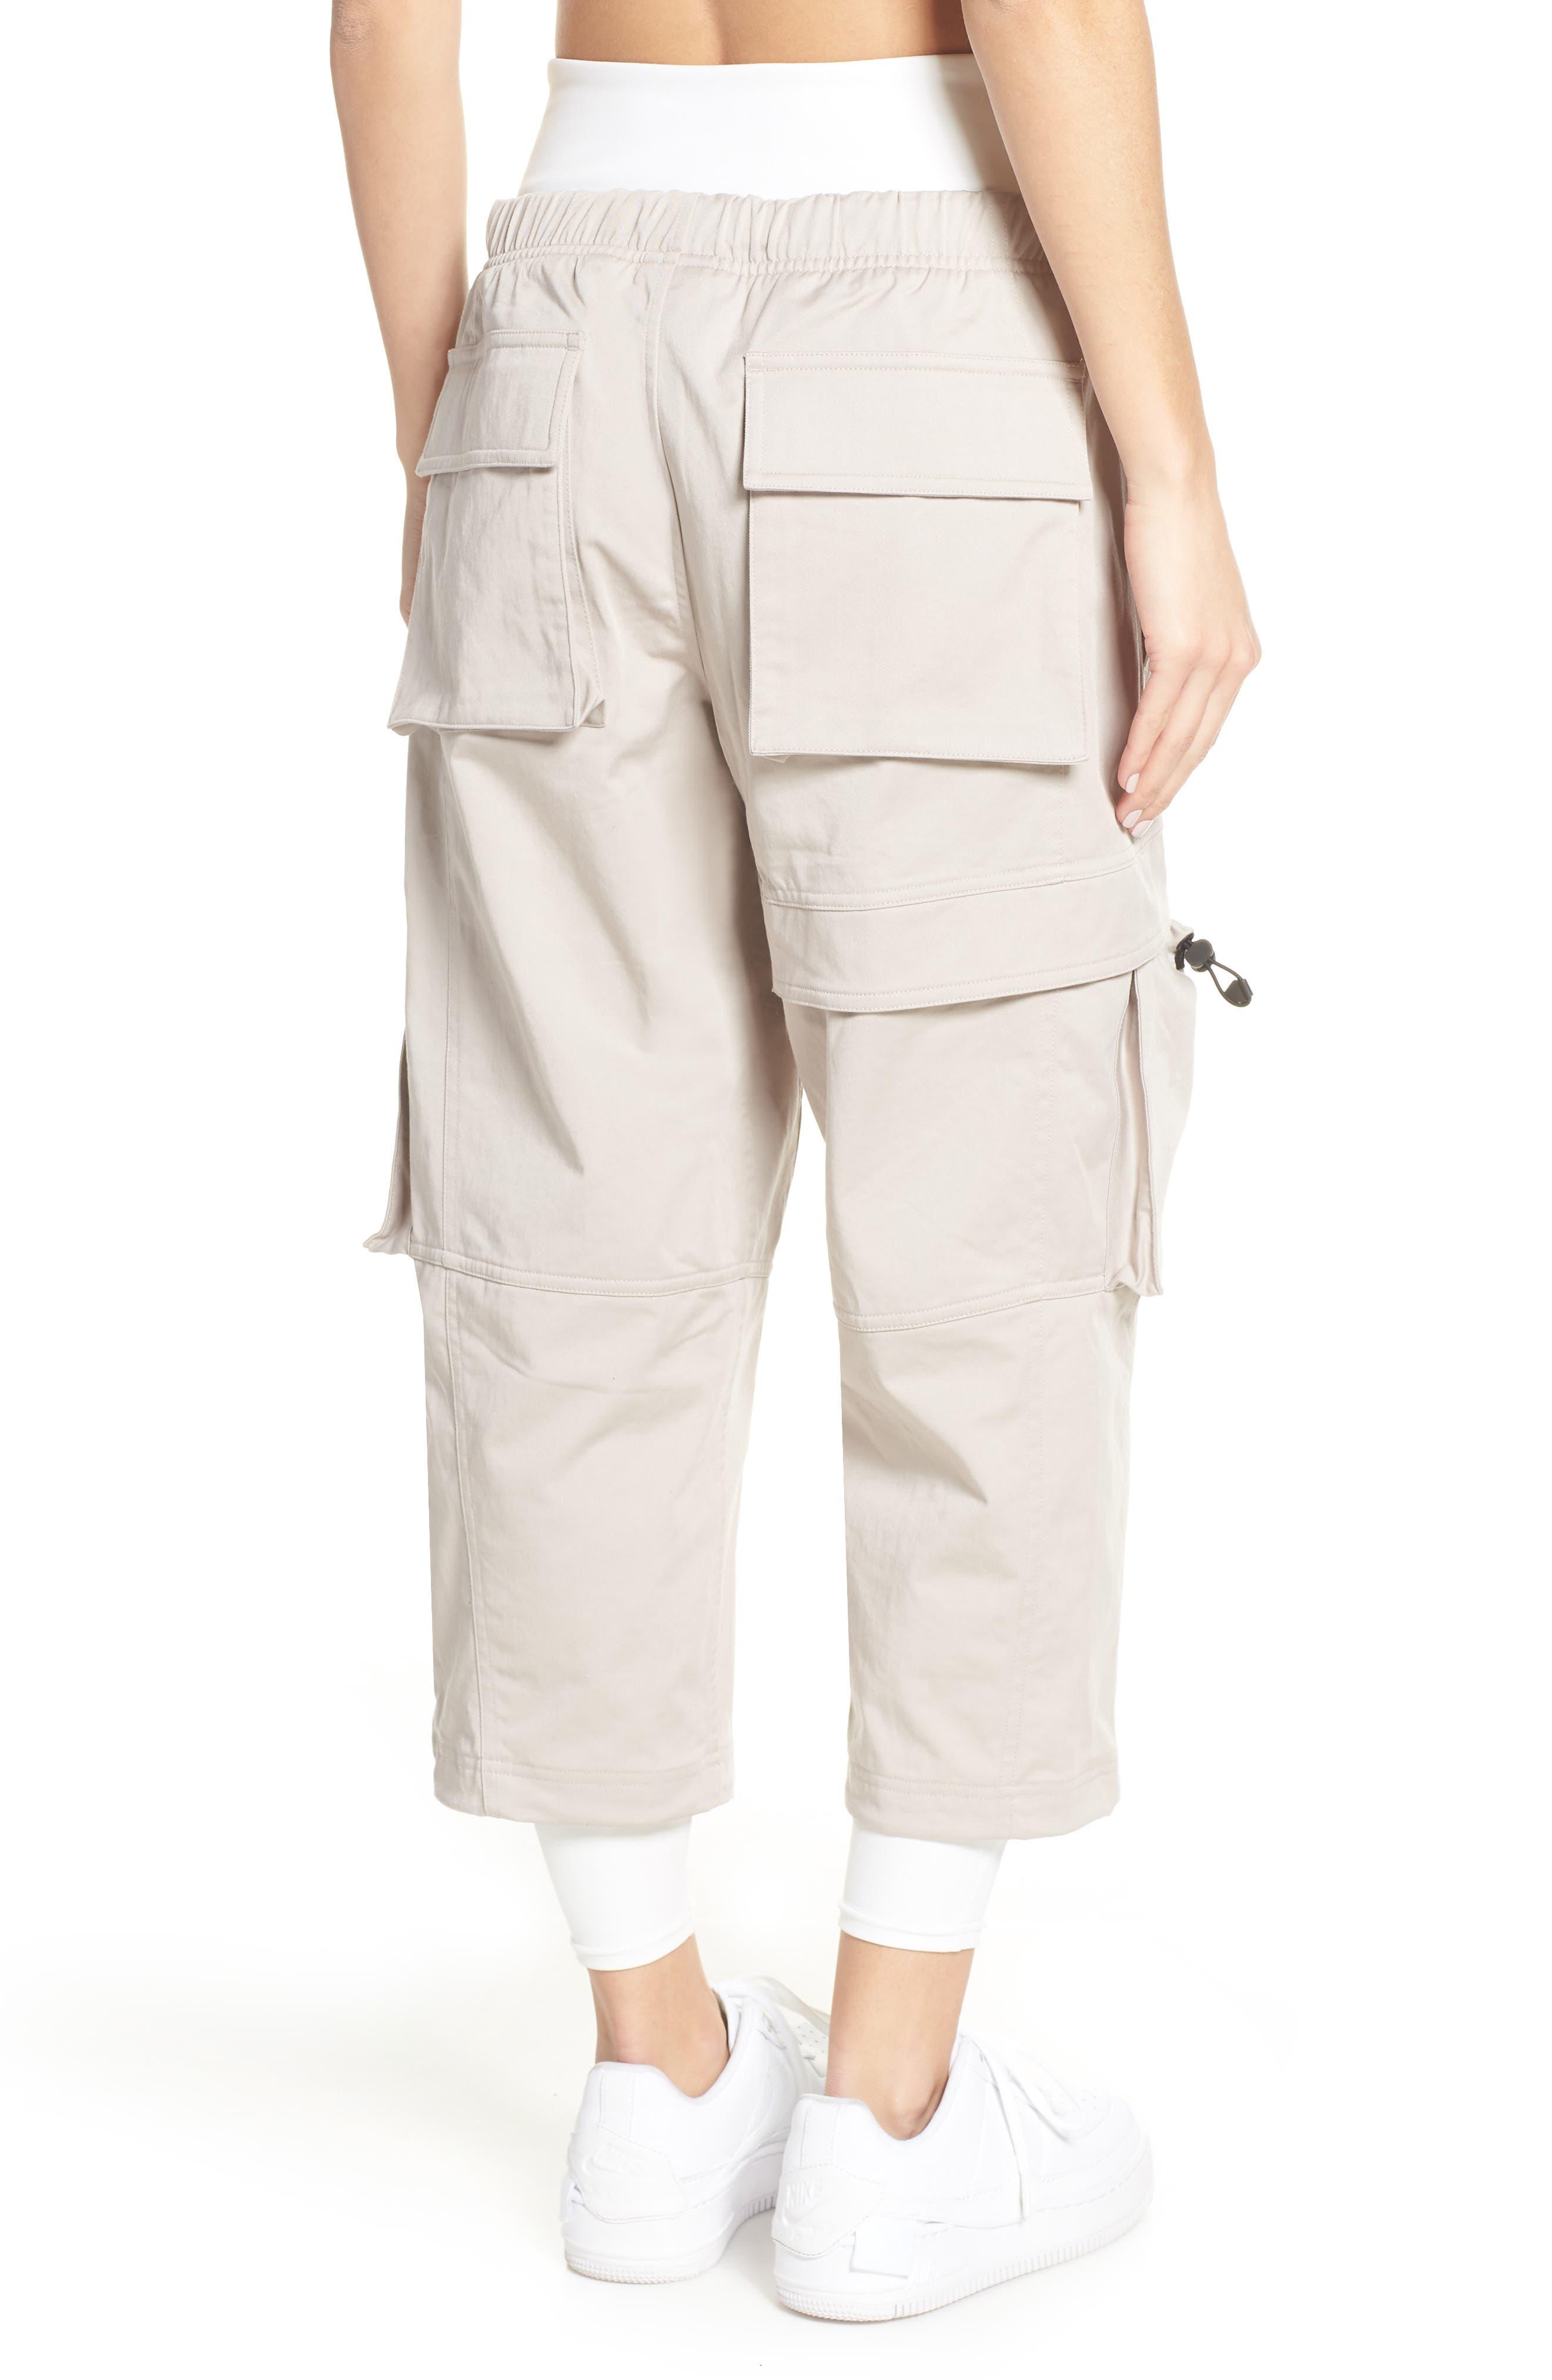 NIKE,                             ACG Women's Cargo Pants,                             Alternate thumbnail 2, color,                             MOON PARTICLE